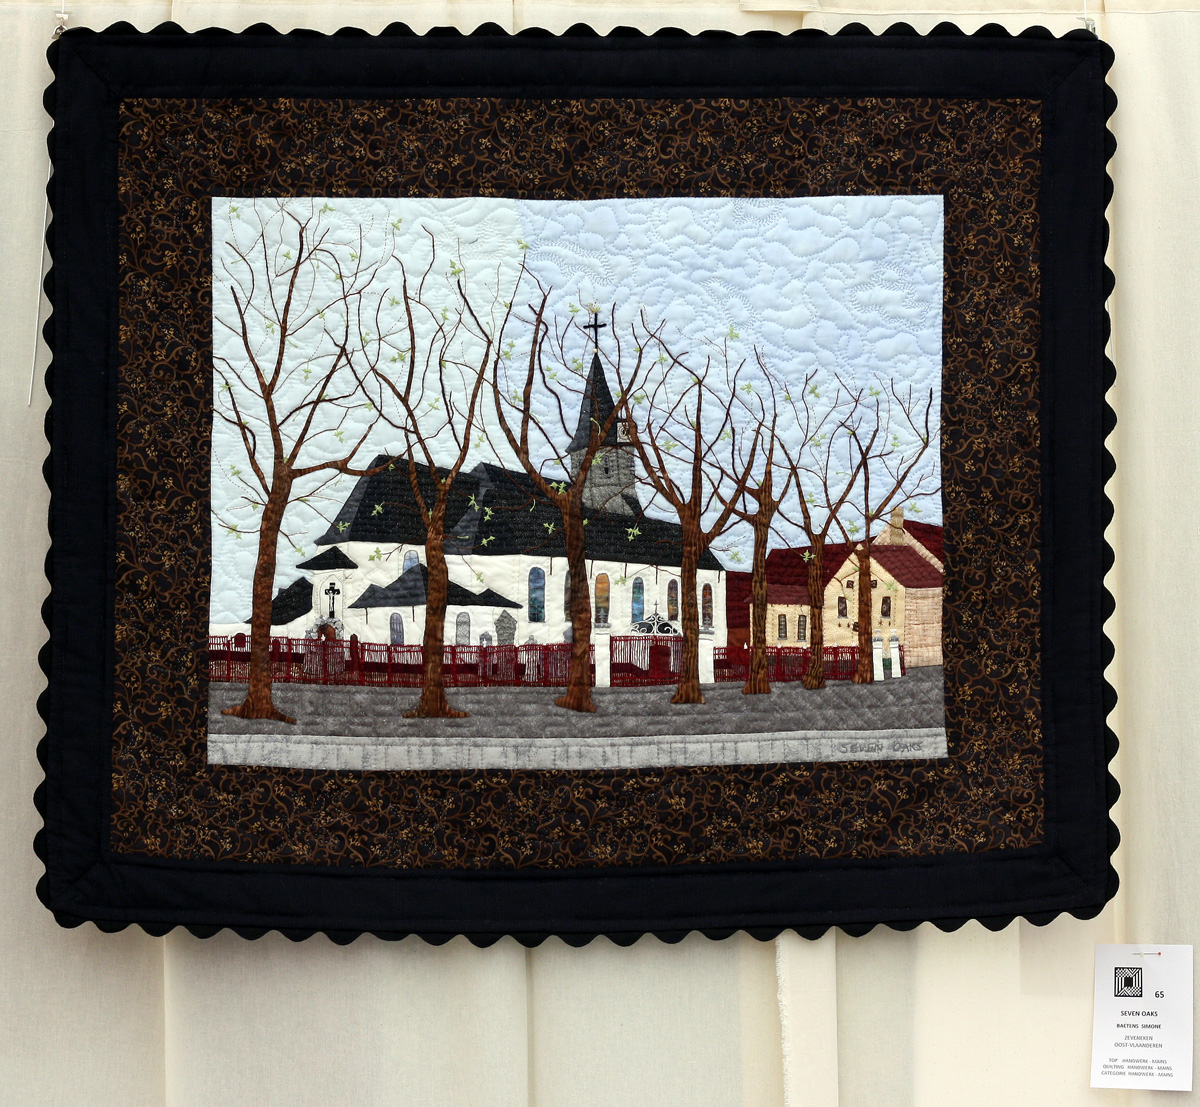 16    n°  65    74    Simone  Baetens, Oost-Vlaanderen, Seven oaks, 108 cm x 92 cm